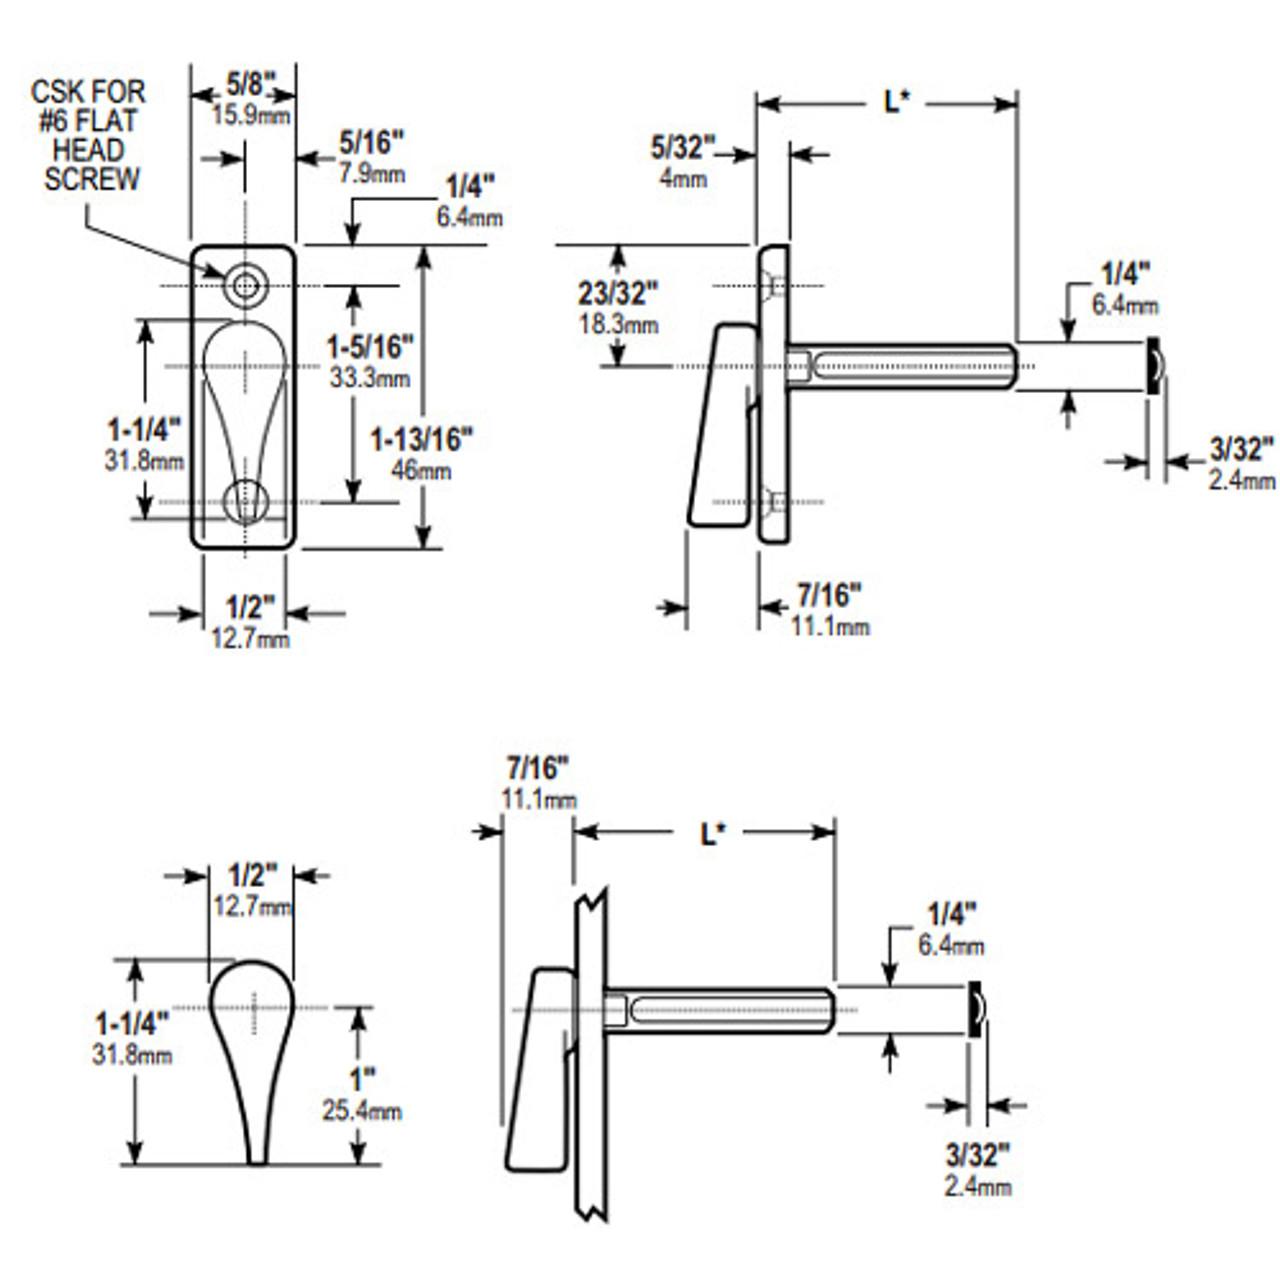 1000-11-30-121 Adams Rite 1000 Series Turns Dimensional View